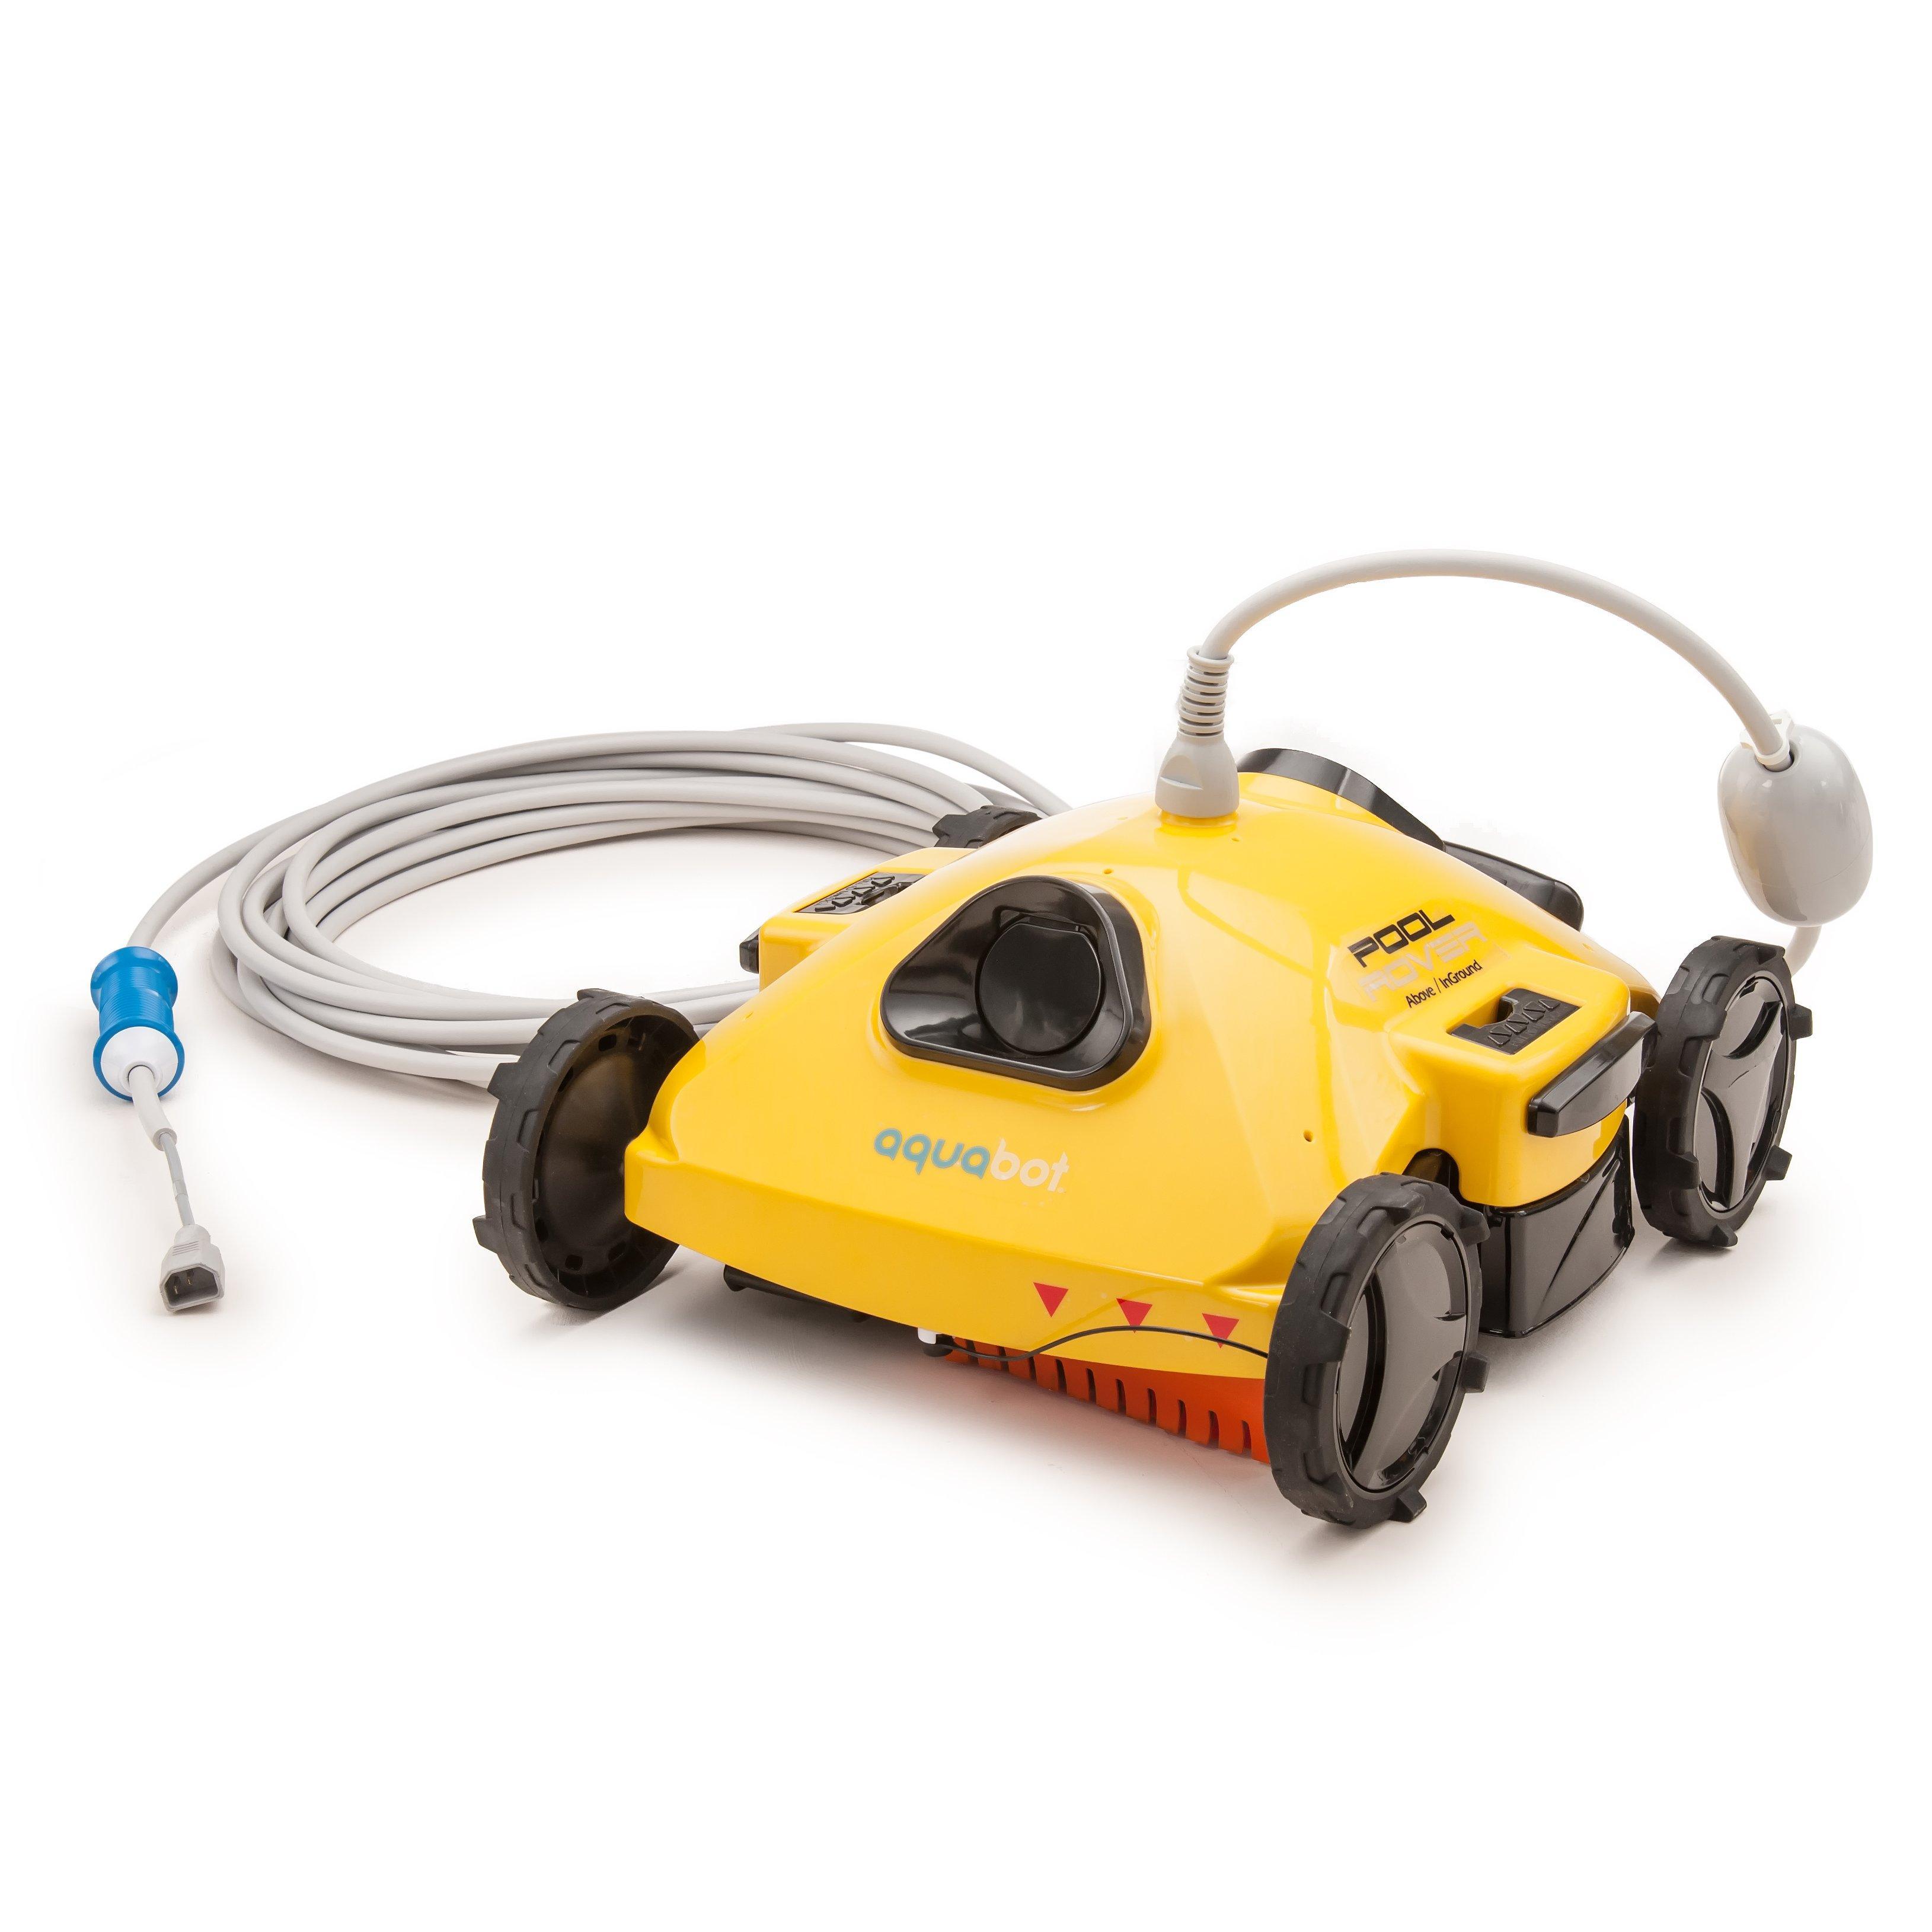 Aquabot Pool Rover S2 50 Robotic Pool Cleaner